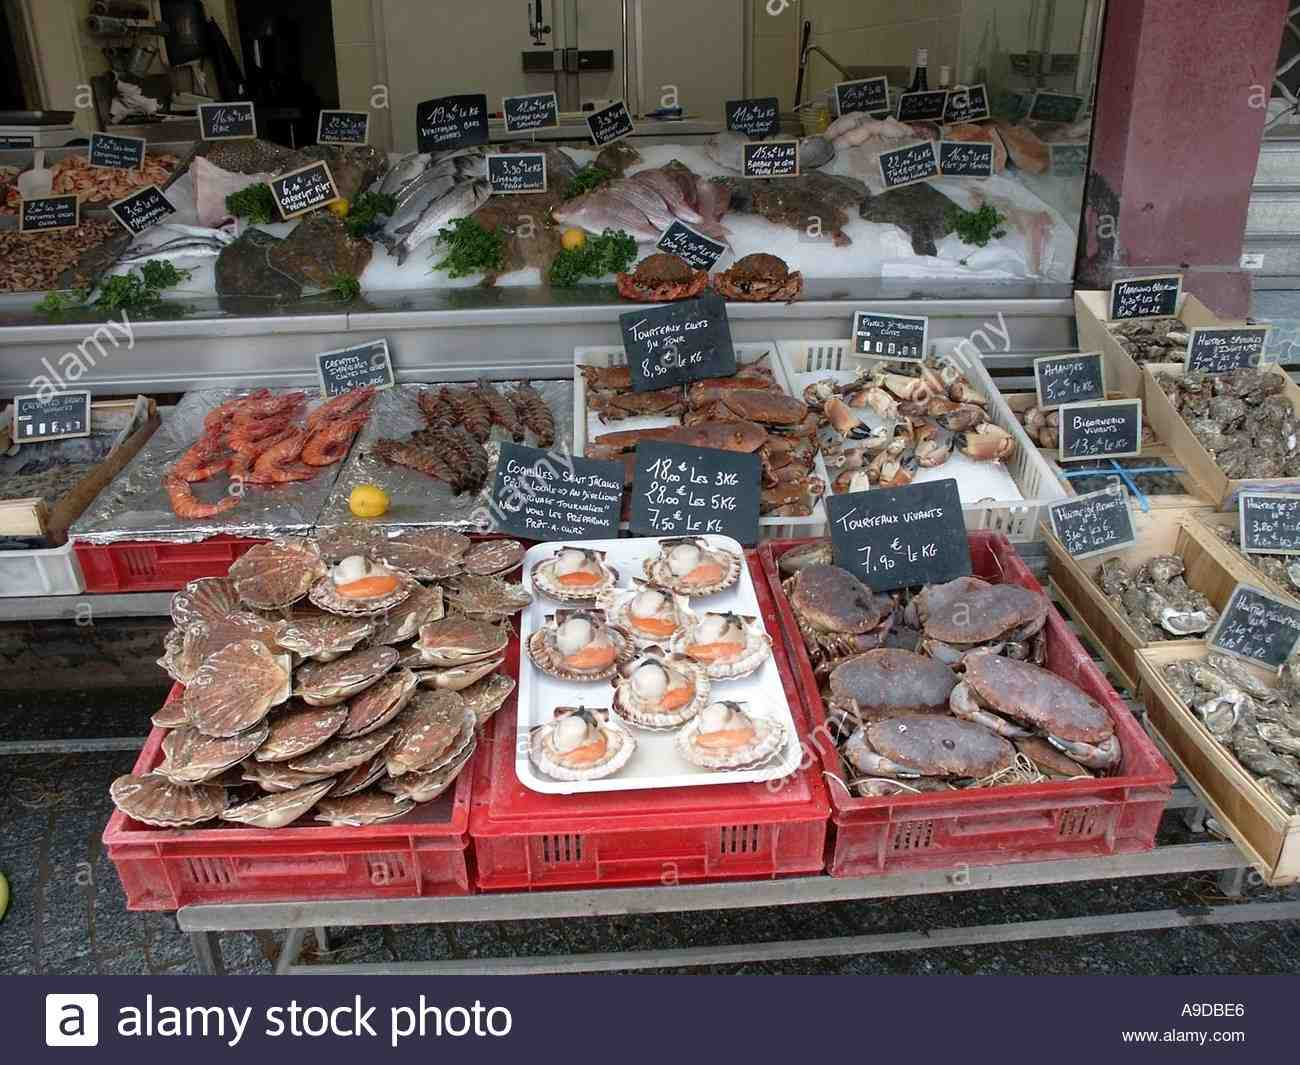 Où manger un plat de fruits de mer à Deauville?